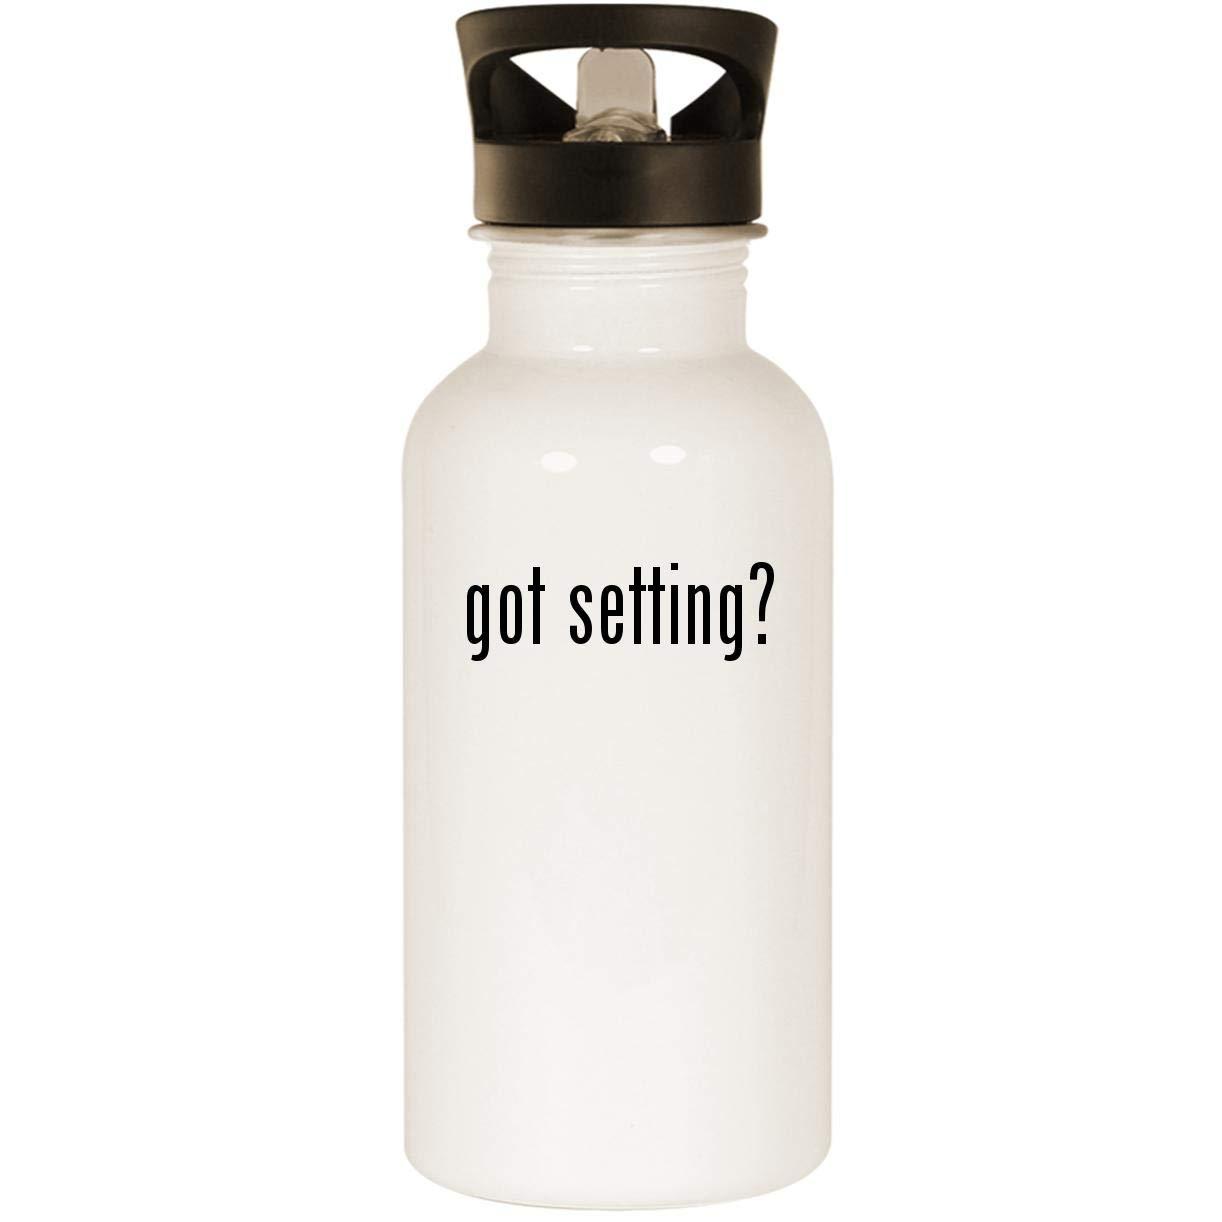 got setting? - Stainless Steel 20oz Road Ready Water Bottle, White